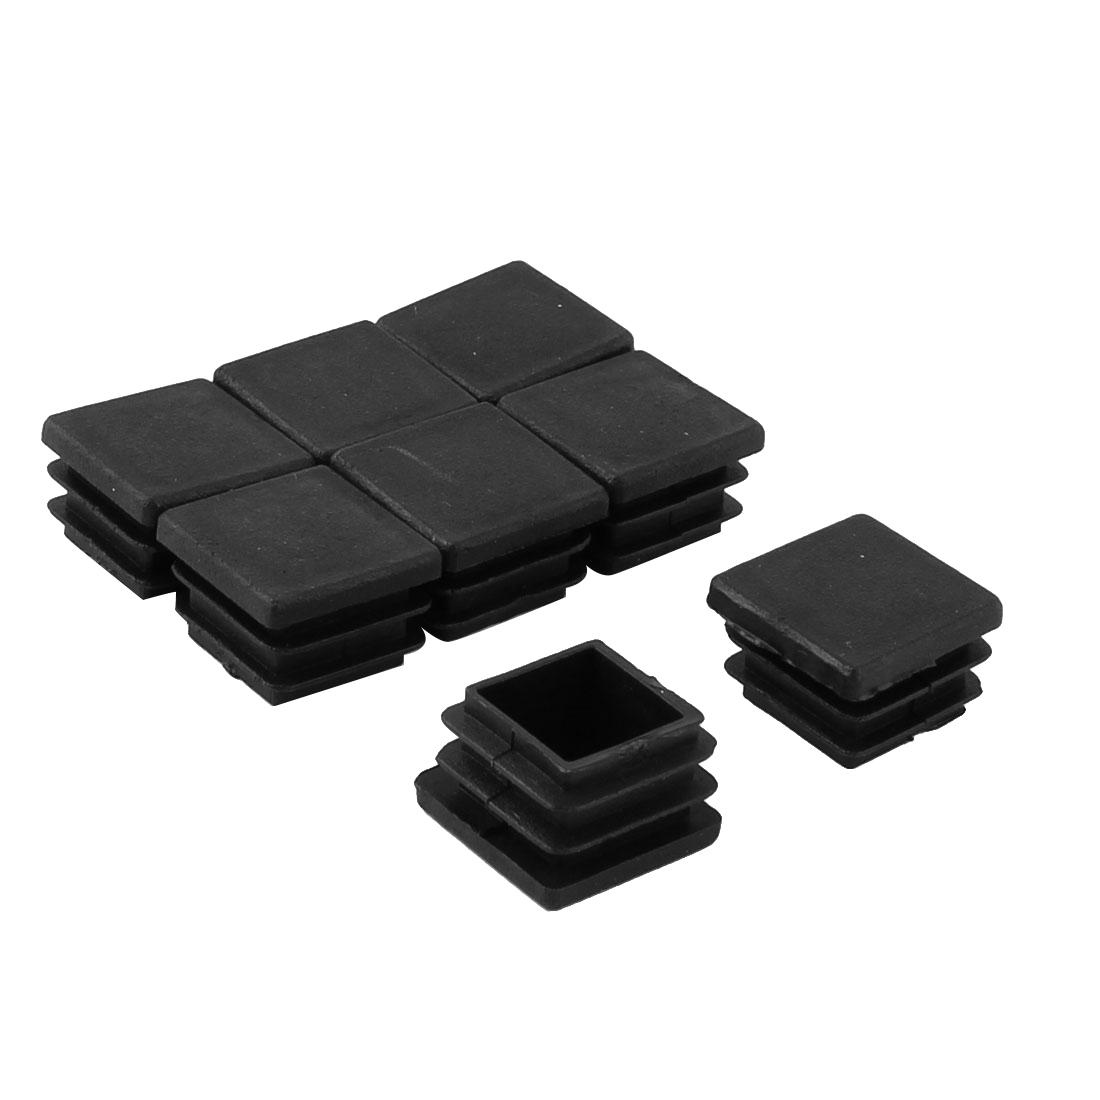 Plastic Square Tube Inserts Furniture Glides End Blanking Caps Black 8pcs